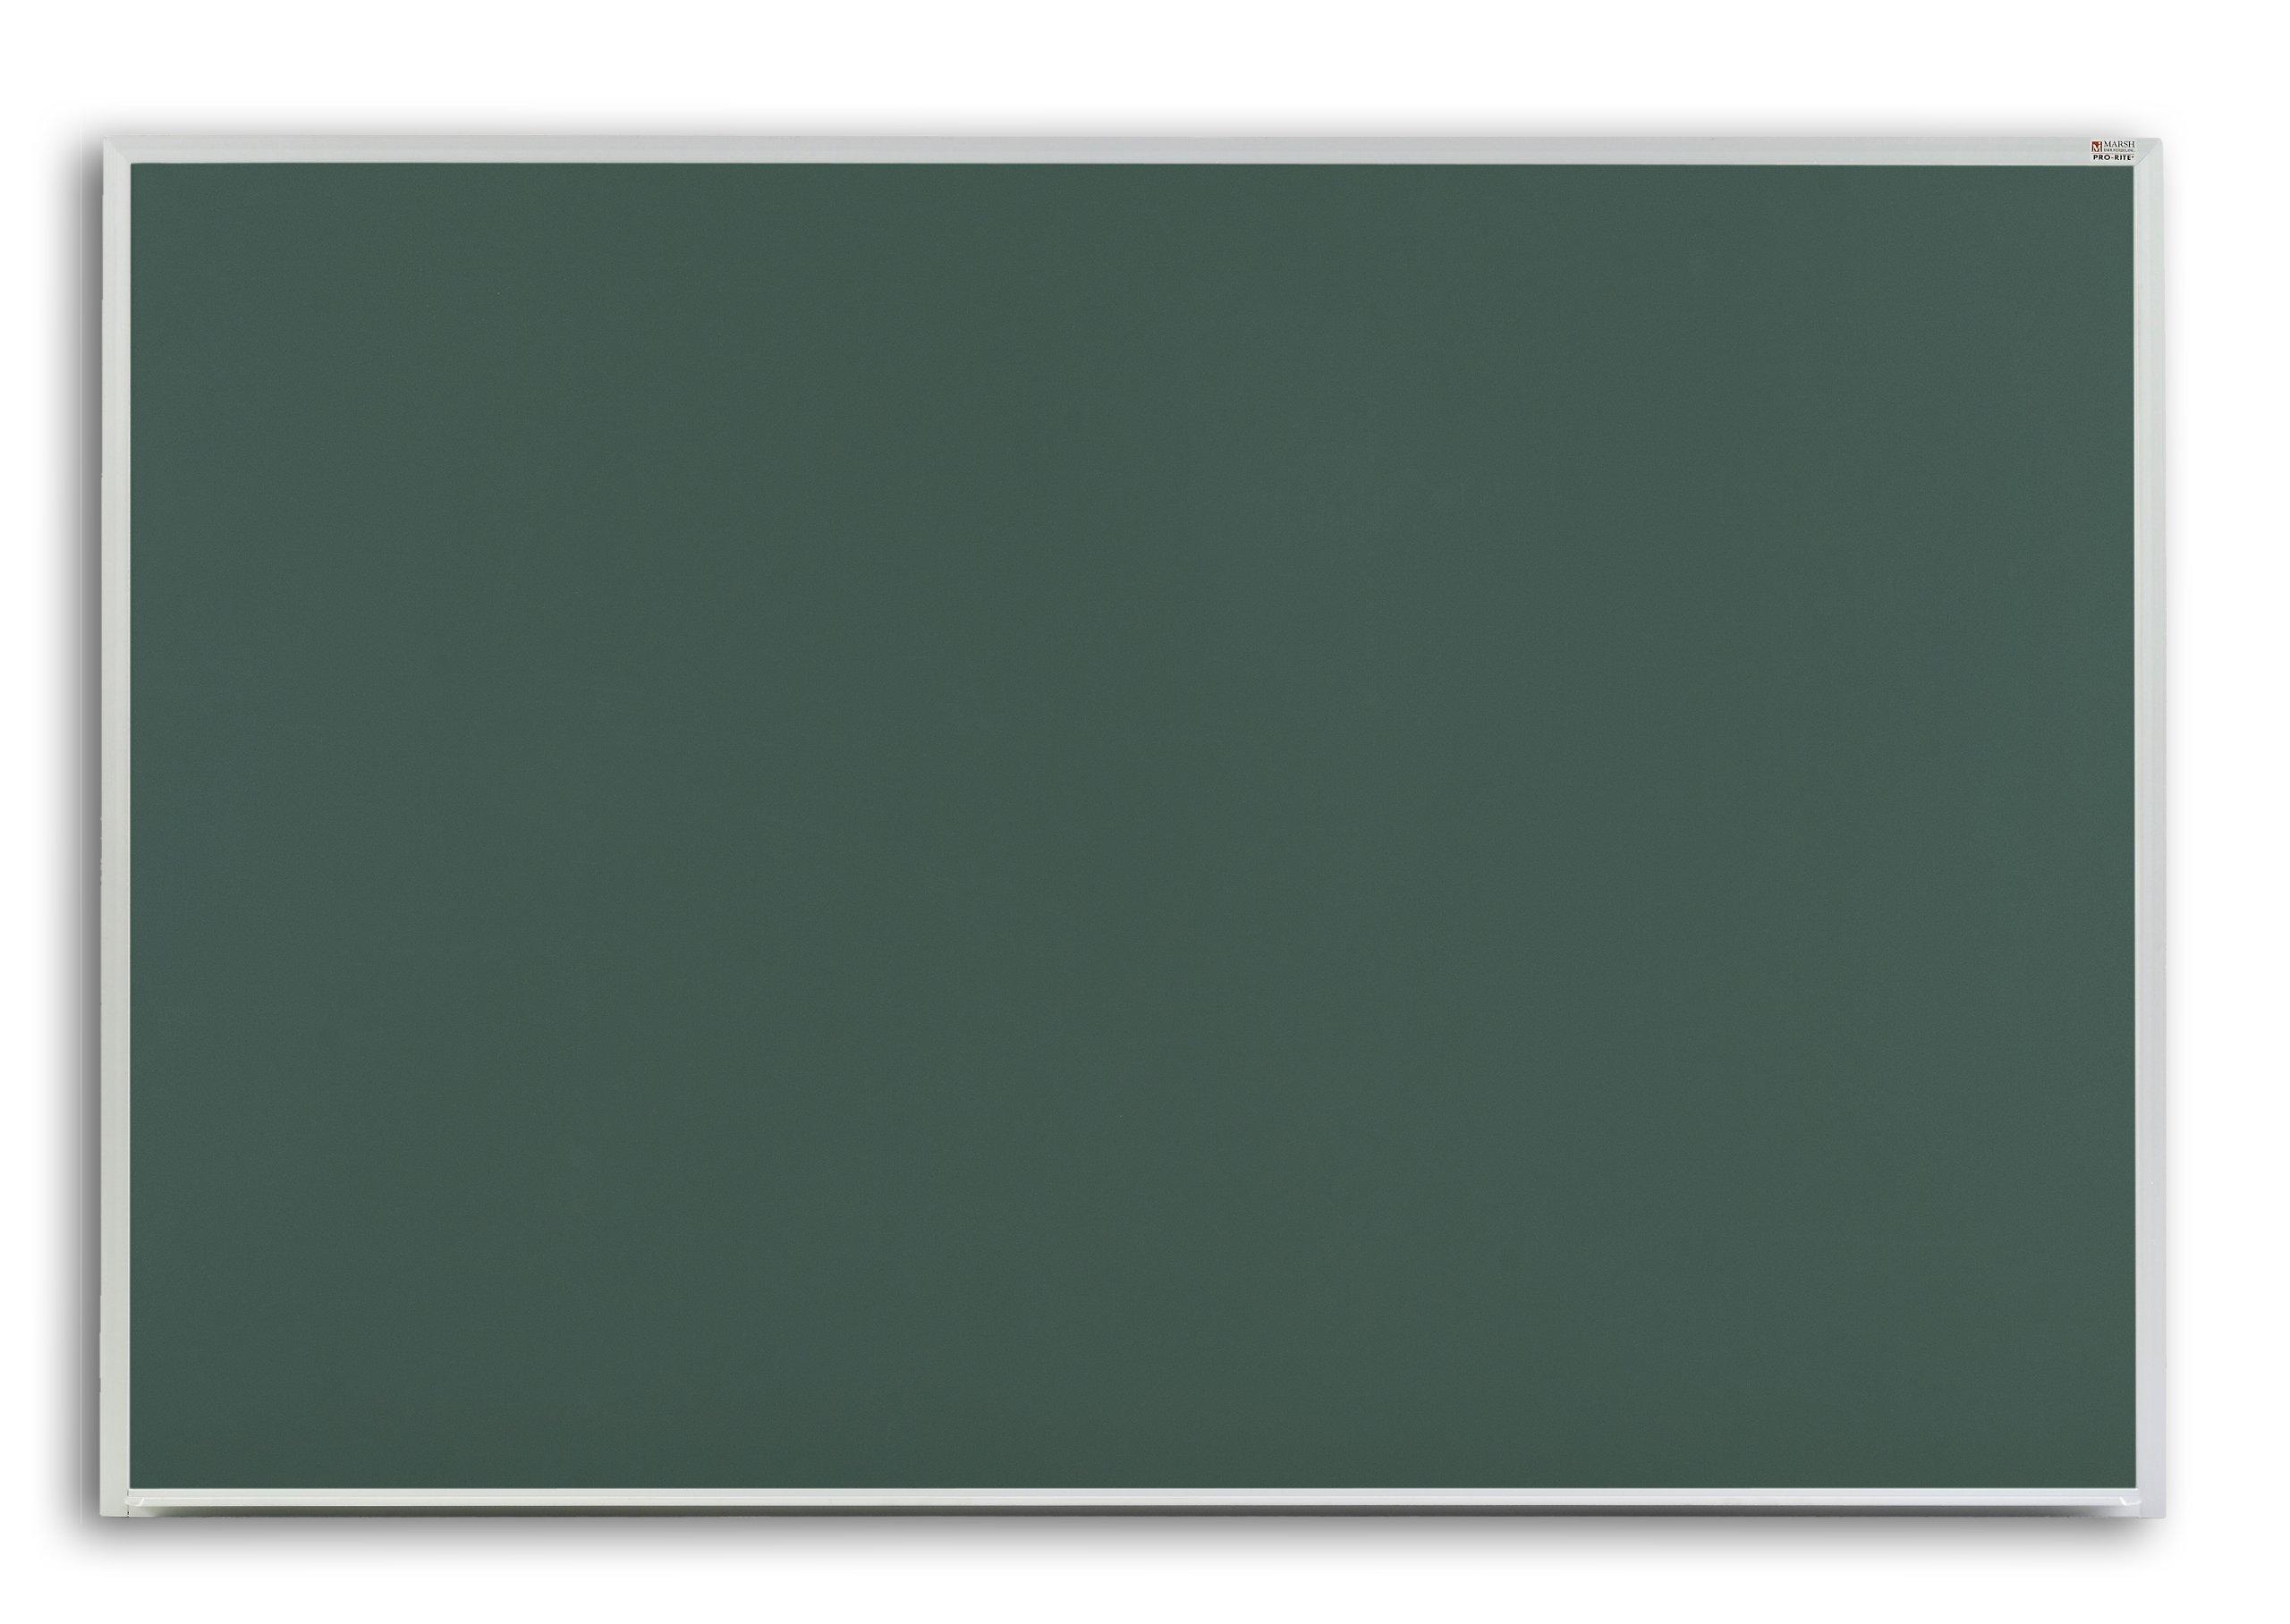 Marsh Pr516-3431-6500 Pro-Rite 60X192 Green Porcelain Chalkboard, Standard With Hanger Bar Aluminum Trim / 1'' Map Rail